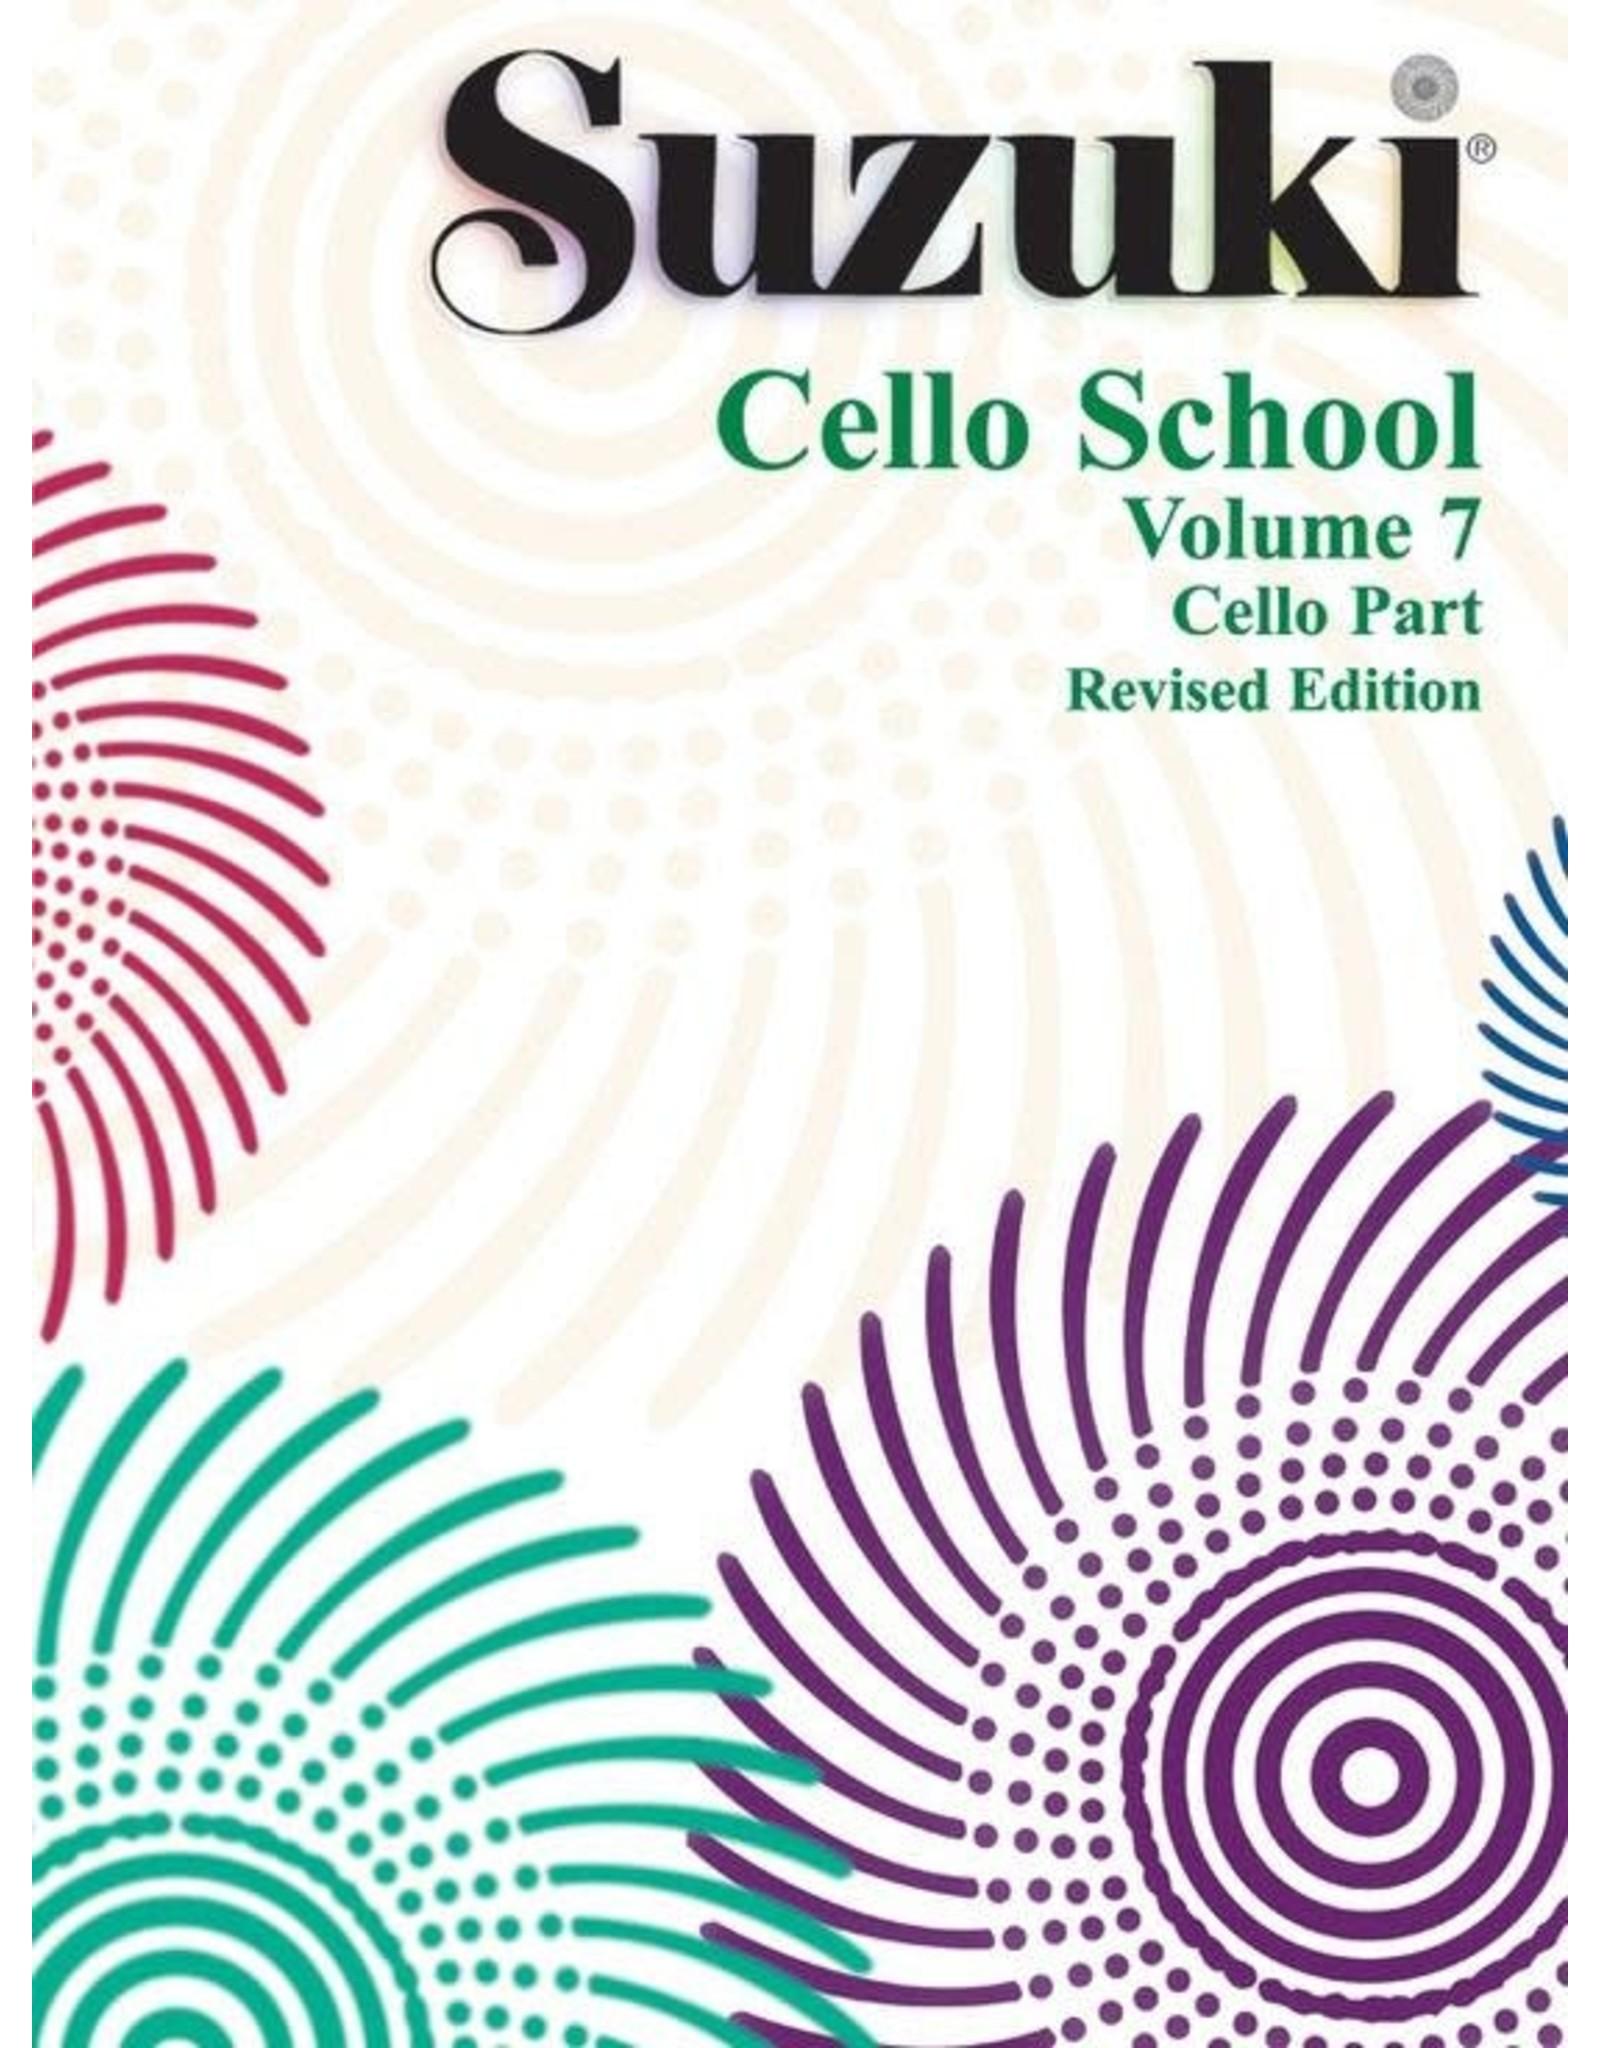 Alfred Suzuki Cello School Volume 7 (Revised Edition)